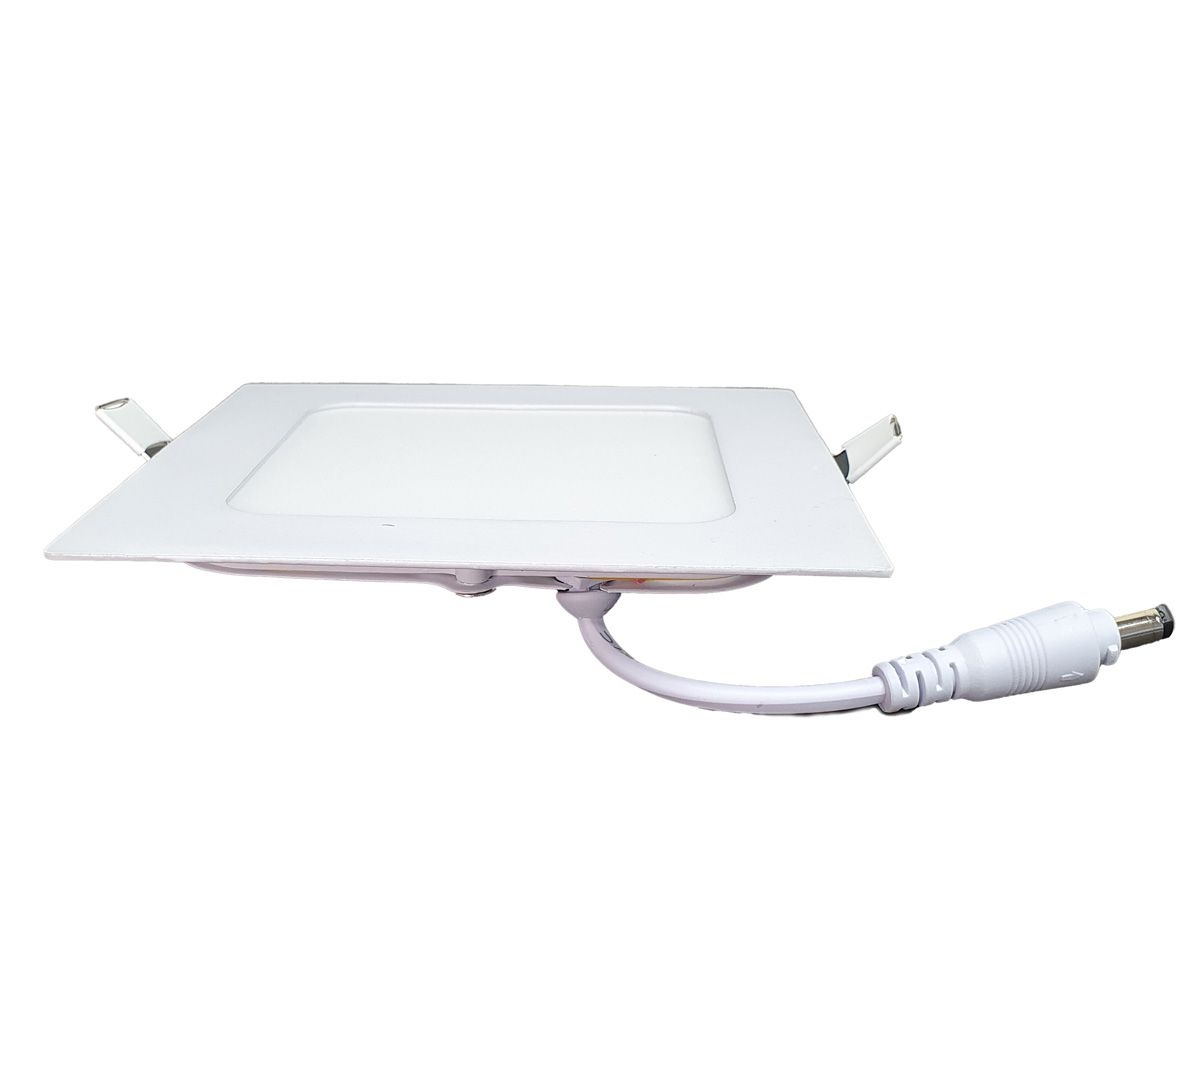 KIT 5 Painel Plafon LED 6w Quadrado Embutir Branco Frio Luminária